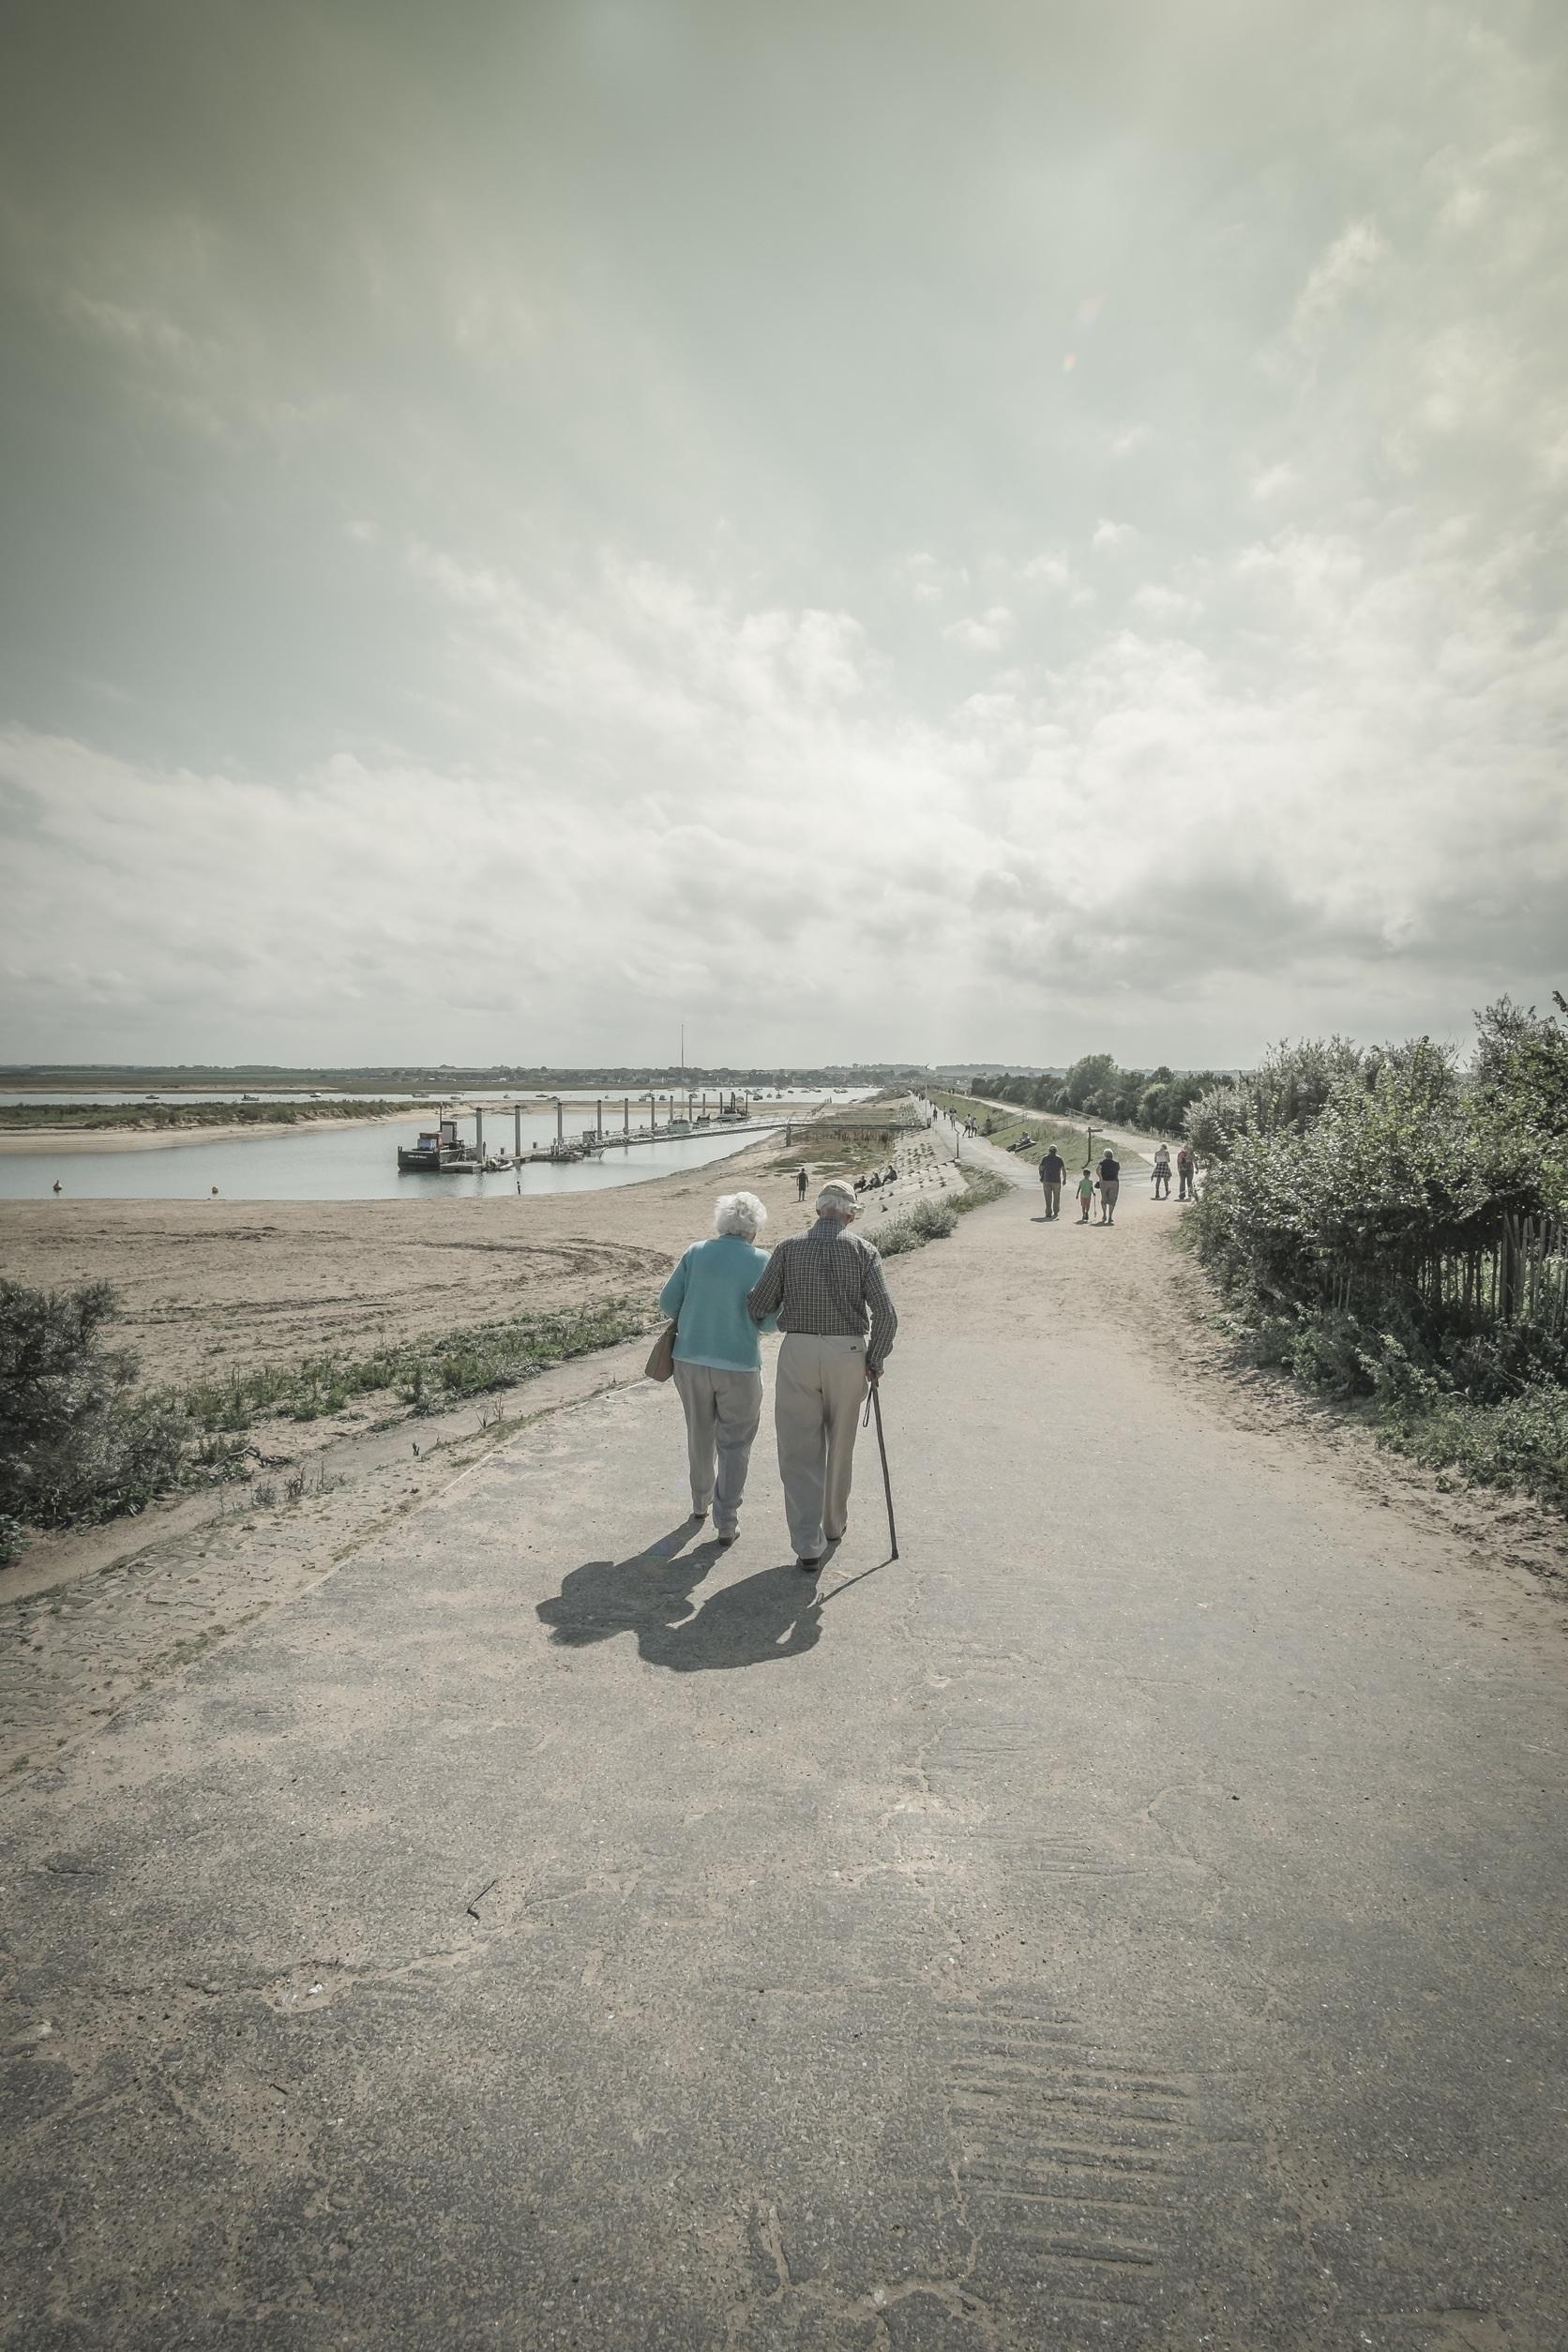 Beach Sea Coast Water Path Sand Ocean Horizon Walking Cloud People Sunshine Sunlight Morning S Wave